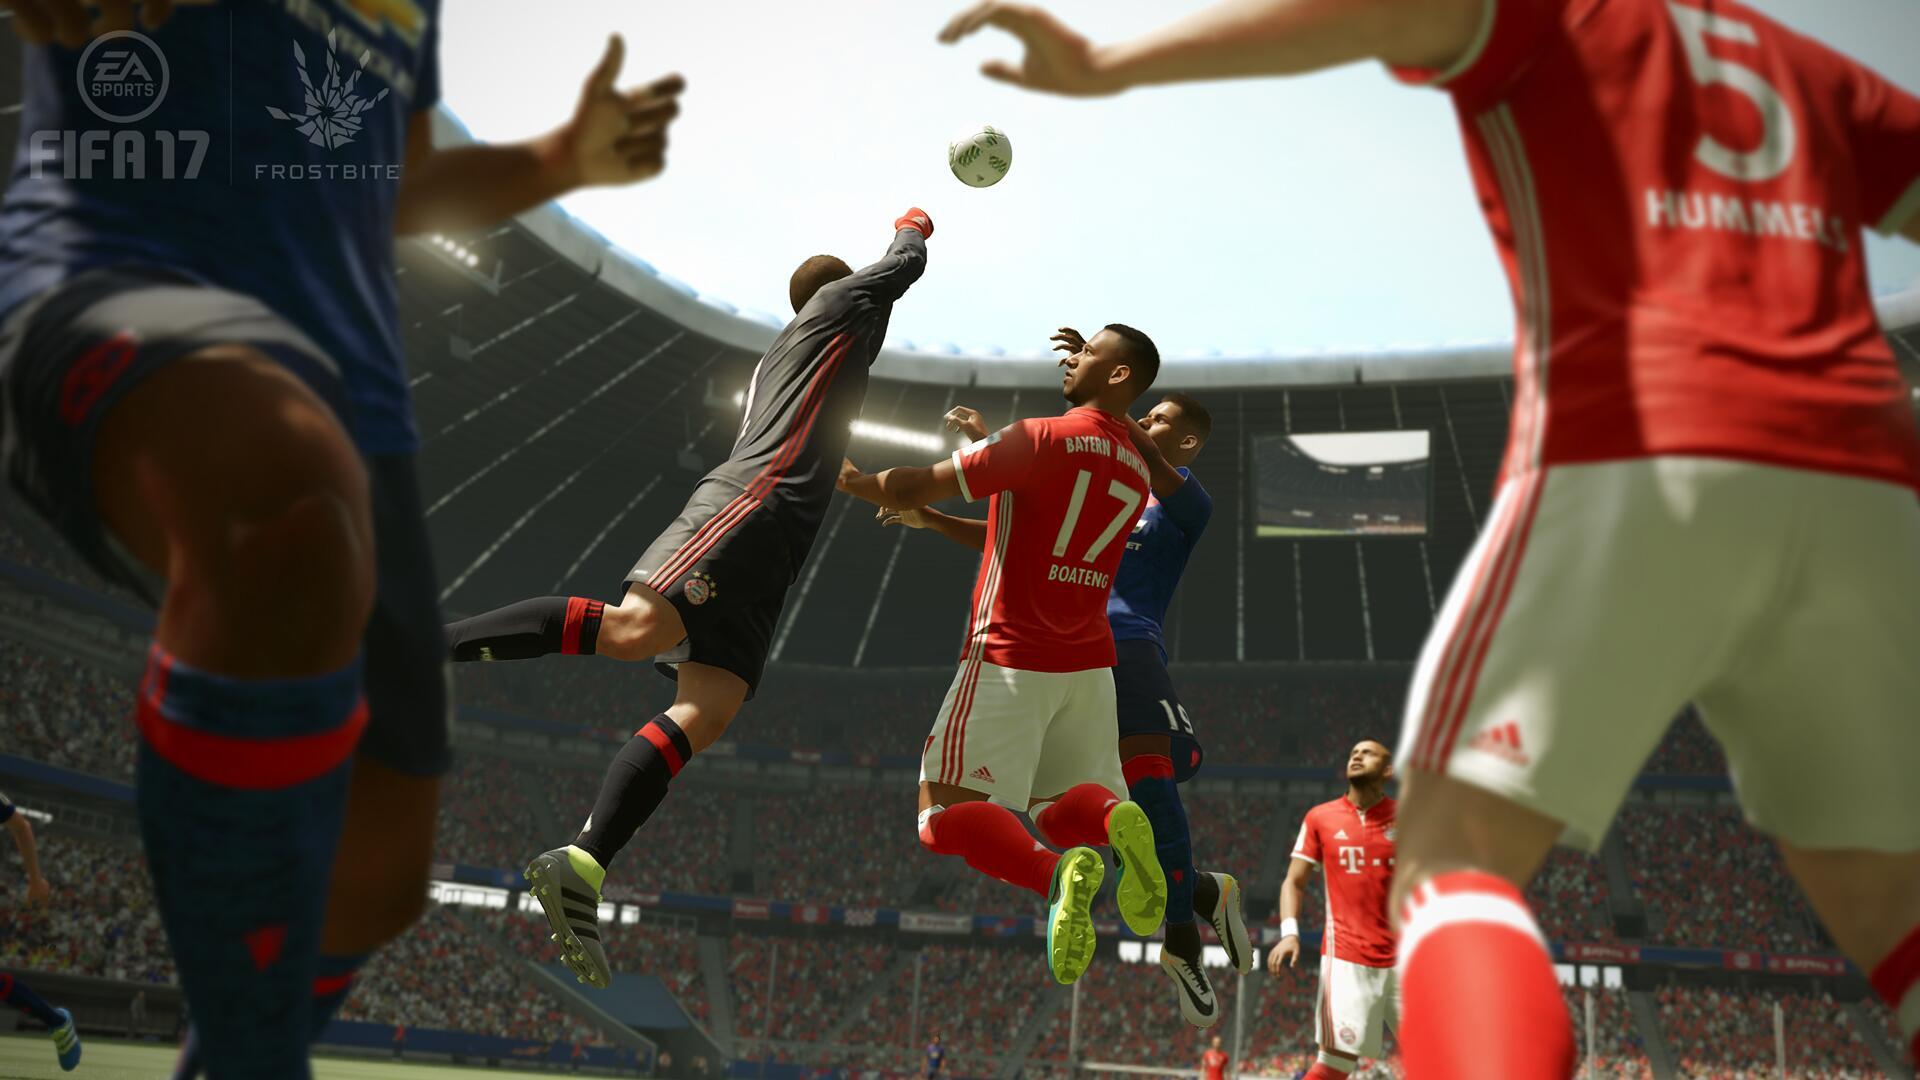 Bild zu Fifa 17